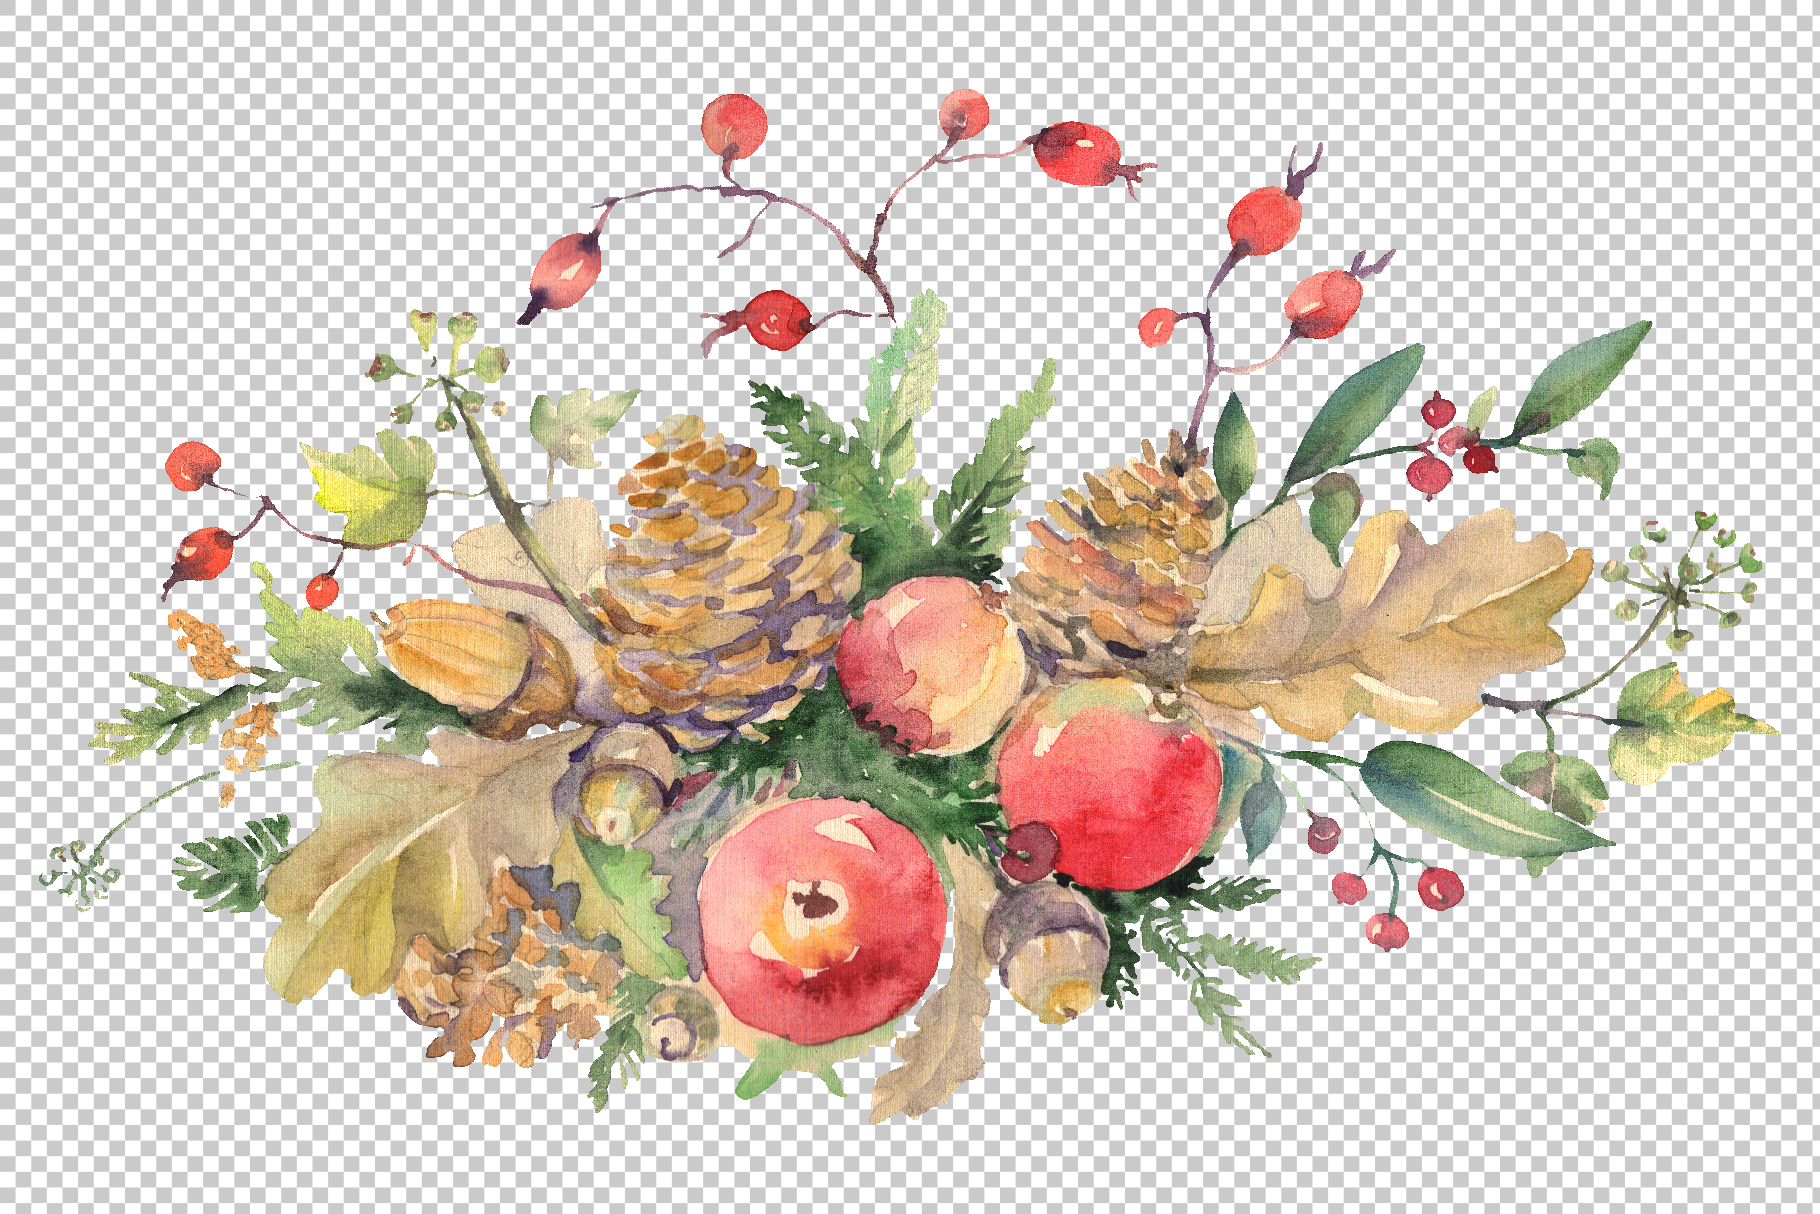 Autumn bouquet Watercolor png example image 2